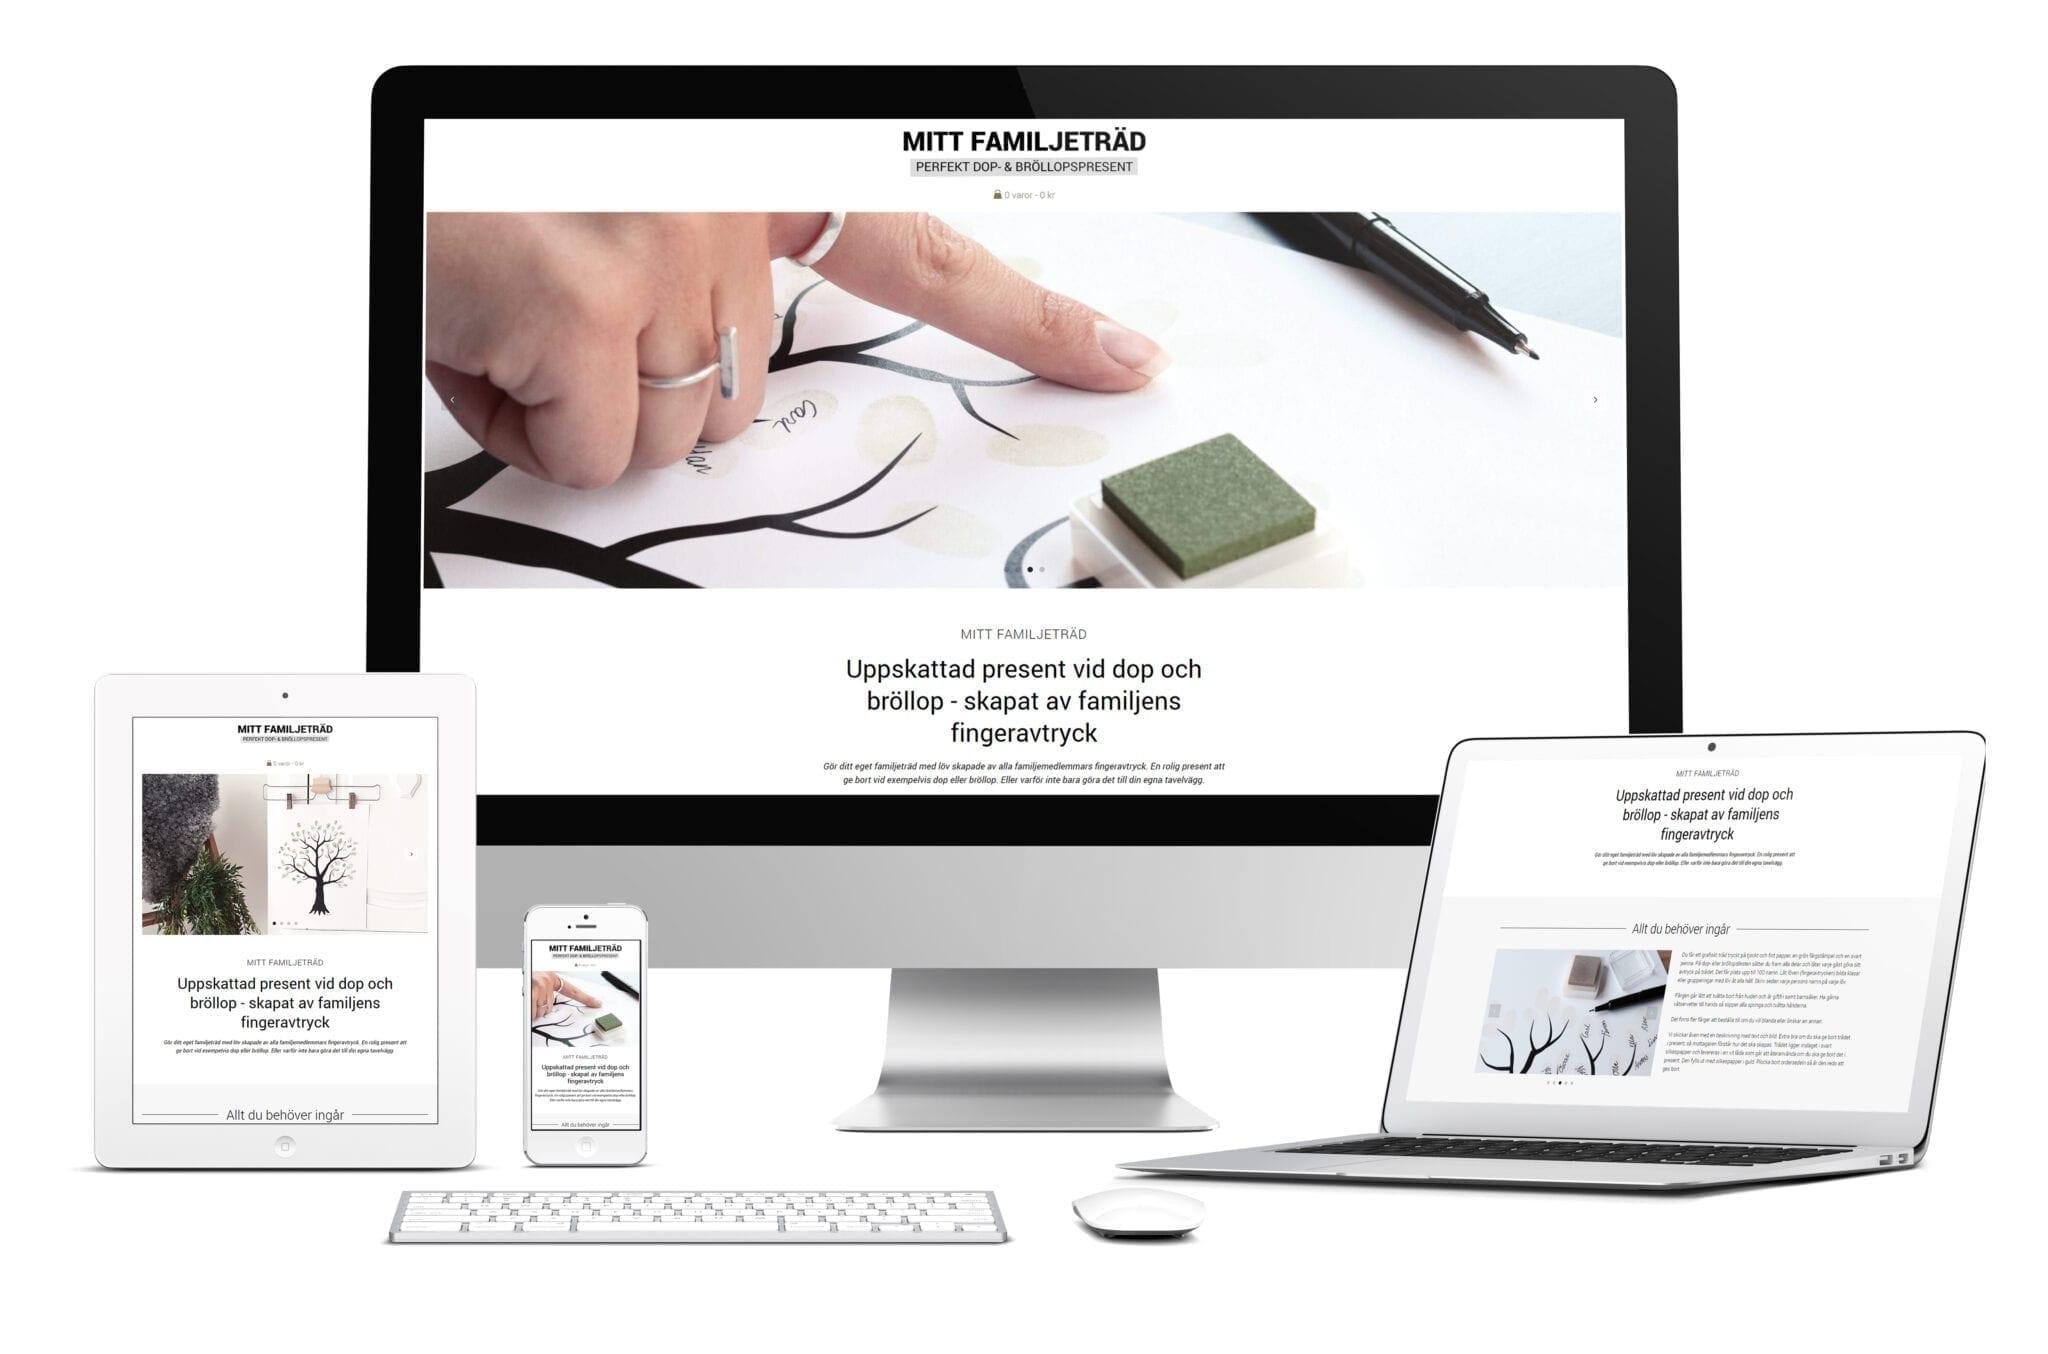 Digitalt visitkort med e-handel